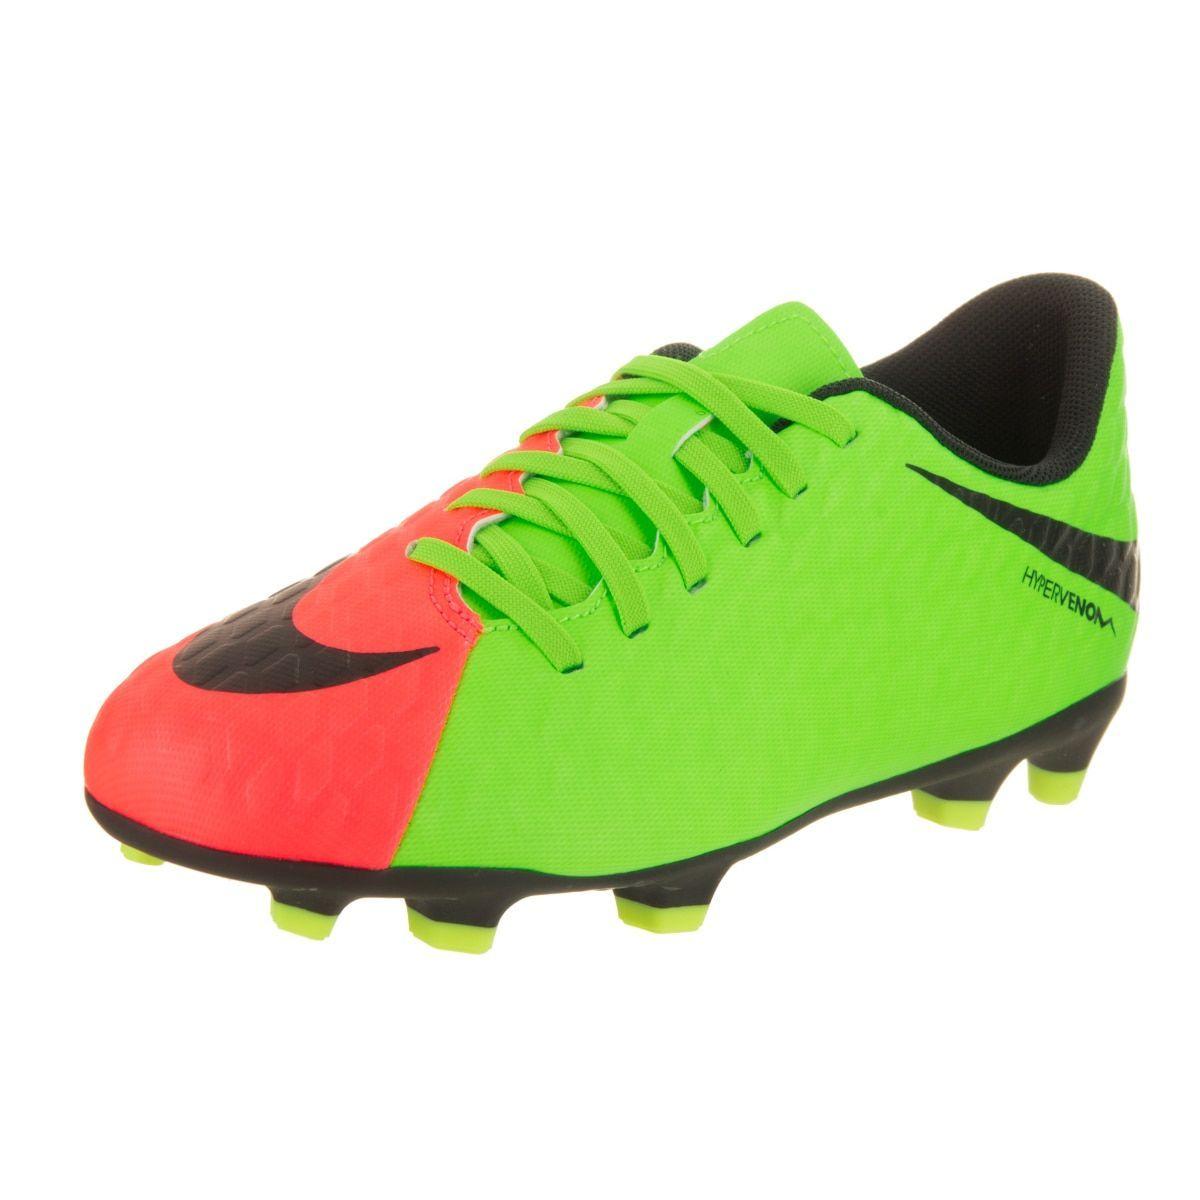 cb414b01ae8 Nike Kids Jr. Boys  Hypervenom Phade III FG Soccer Cleats